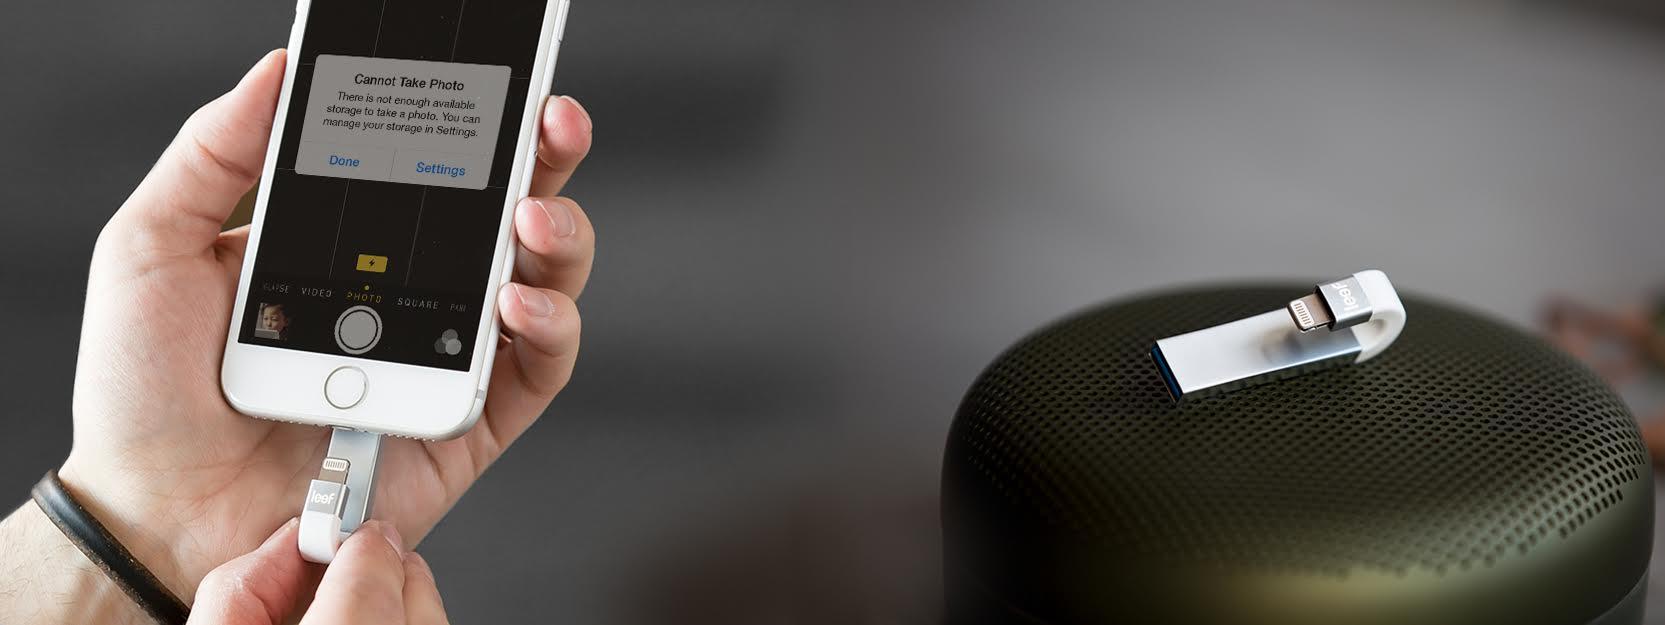 iphone, ipad bez itunes a s větší pamětí